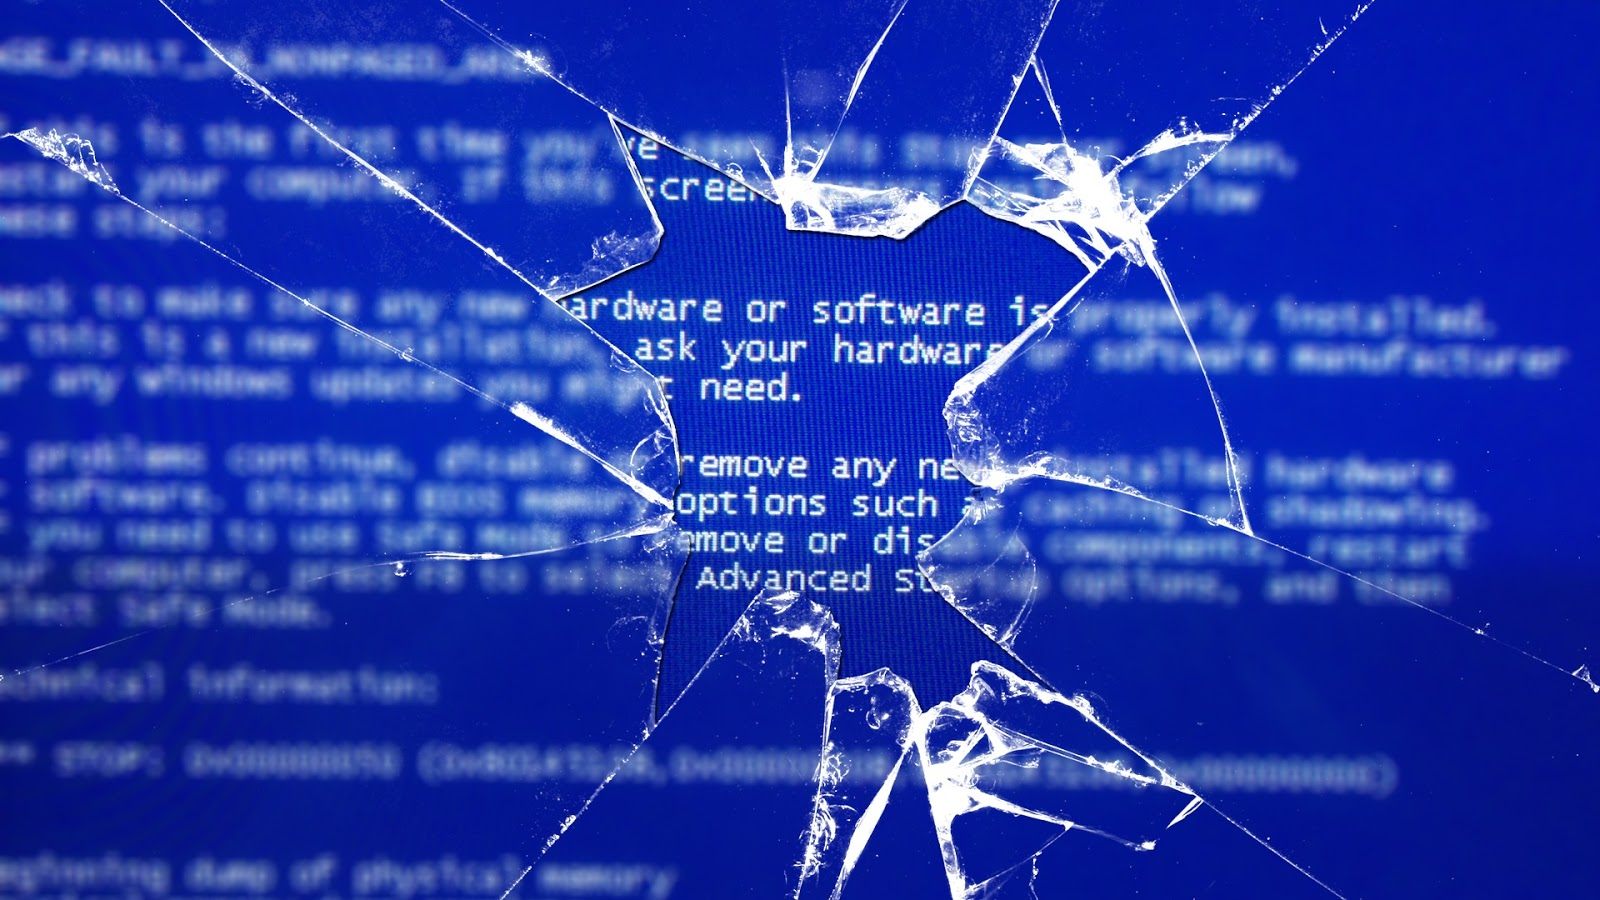 Epic Windows Wallpaper Epic Windows Bsod Broken